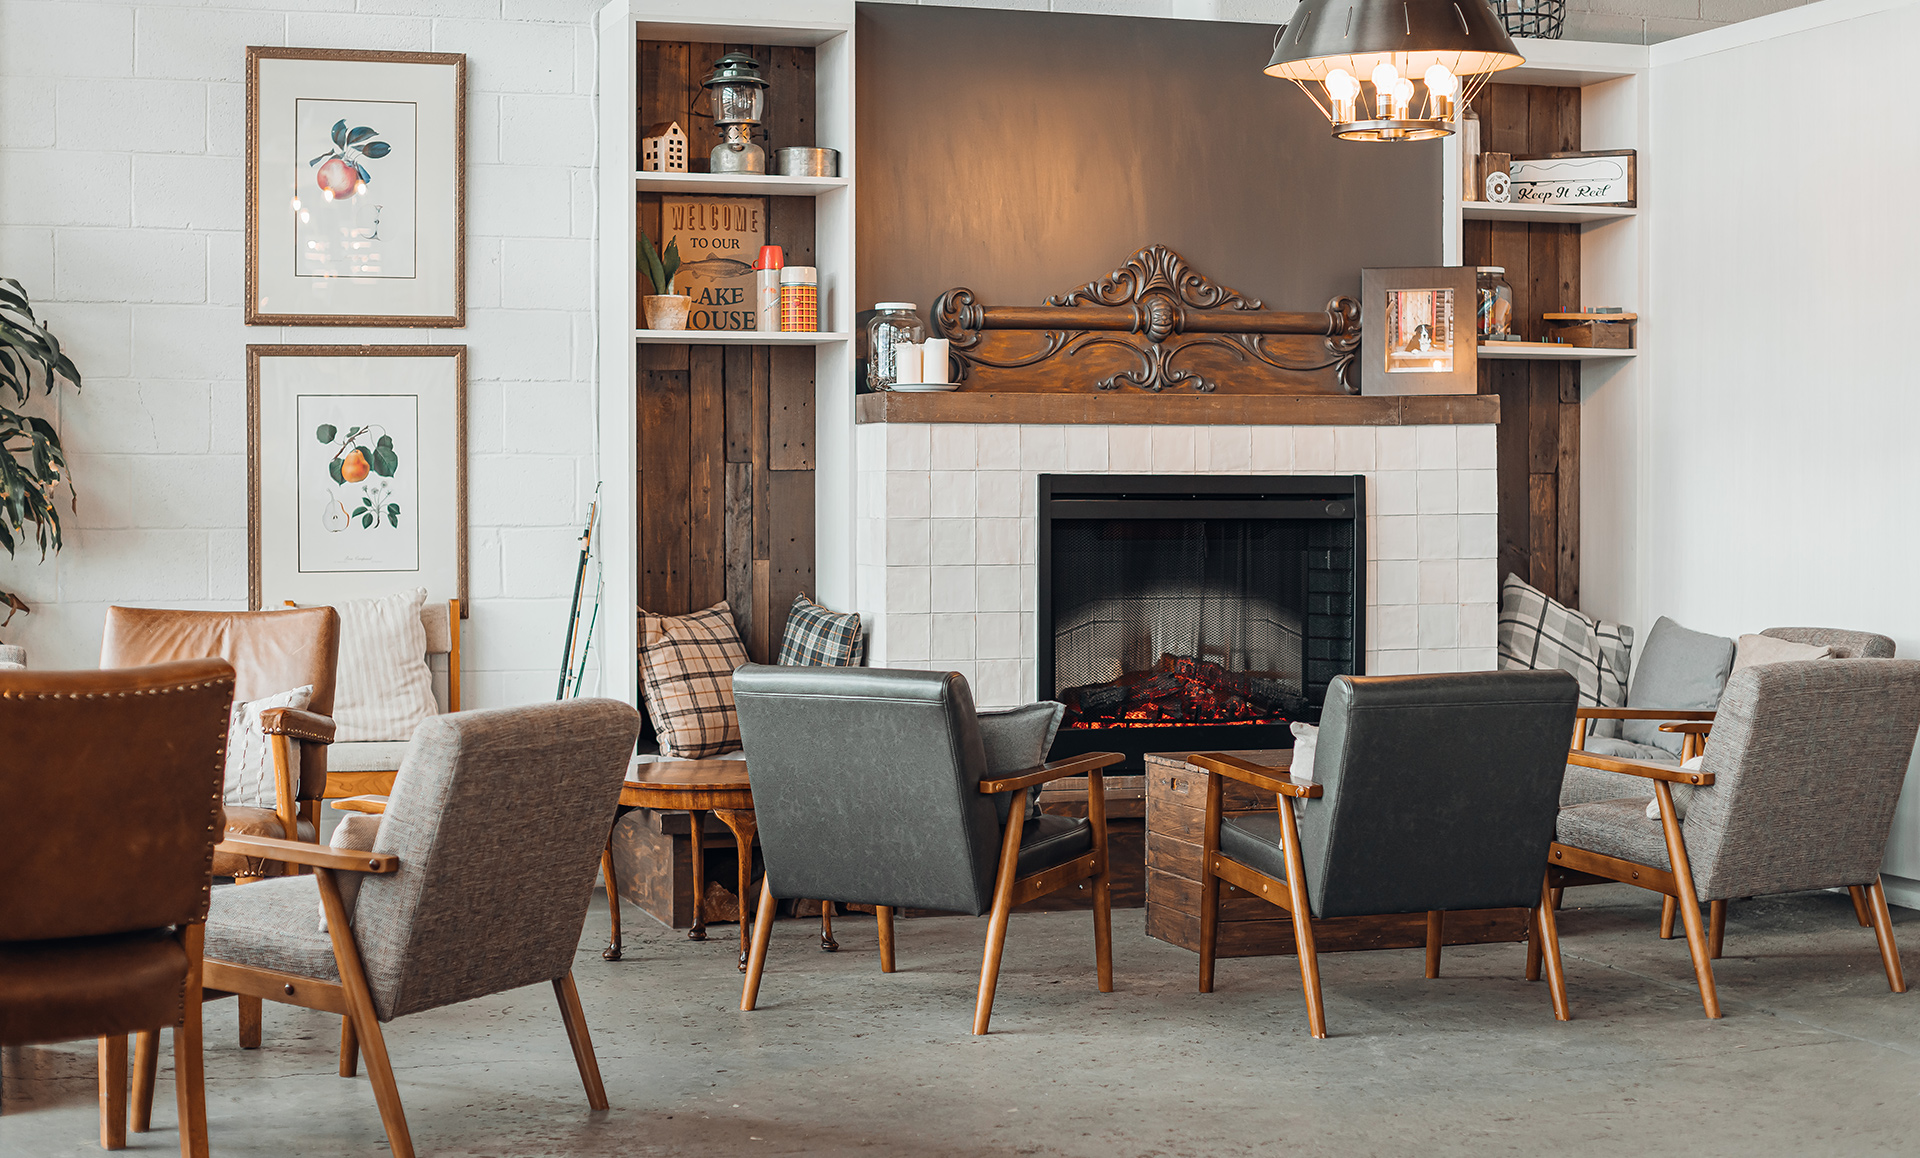 kelowna brewery marketing interior design rustic reel